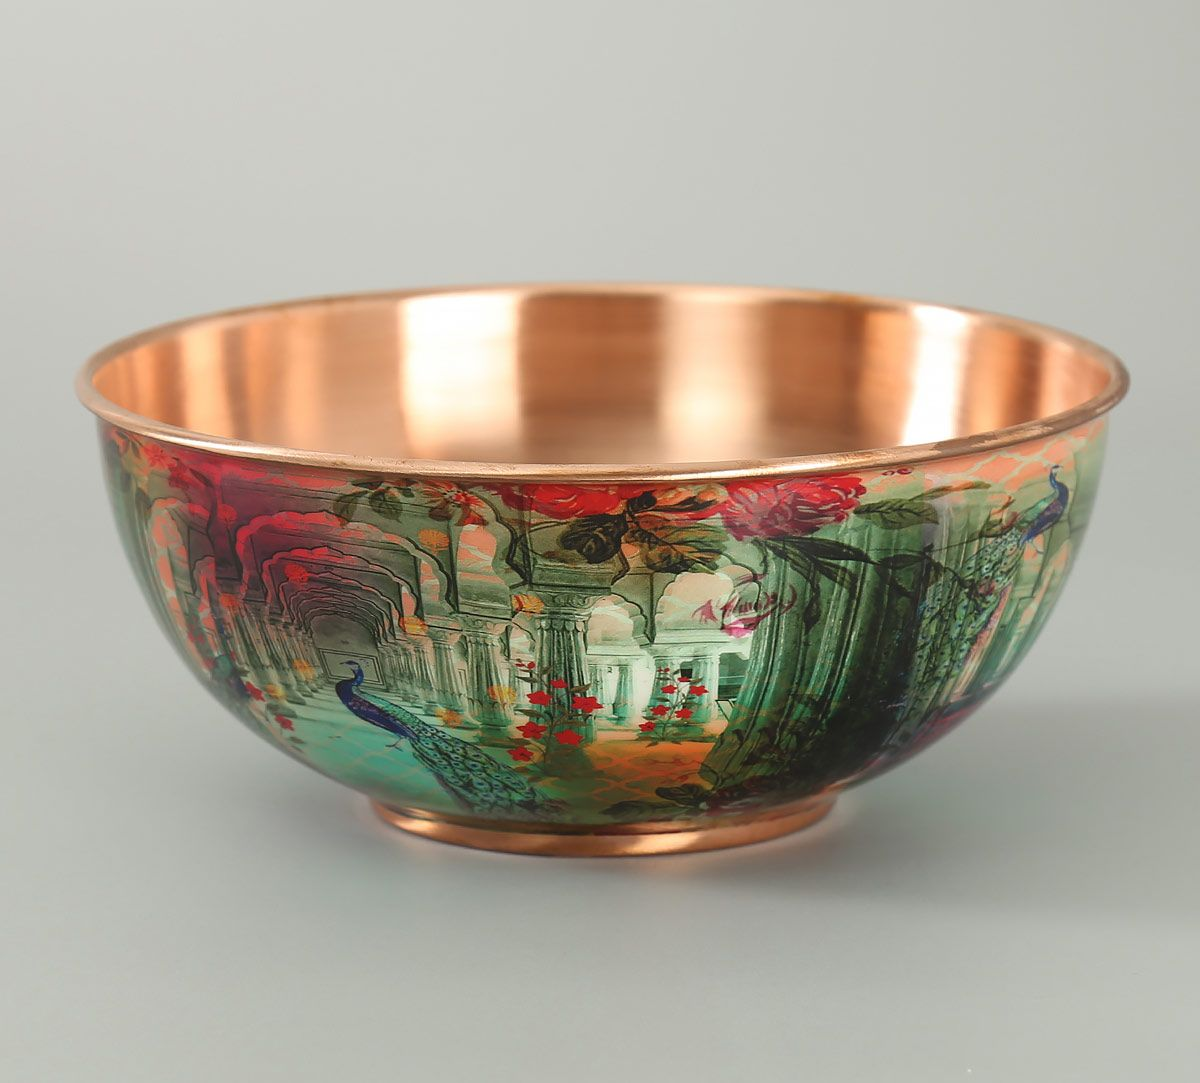 India Circus Peacock Dwar Copper Bowl